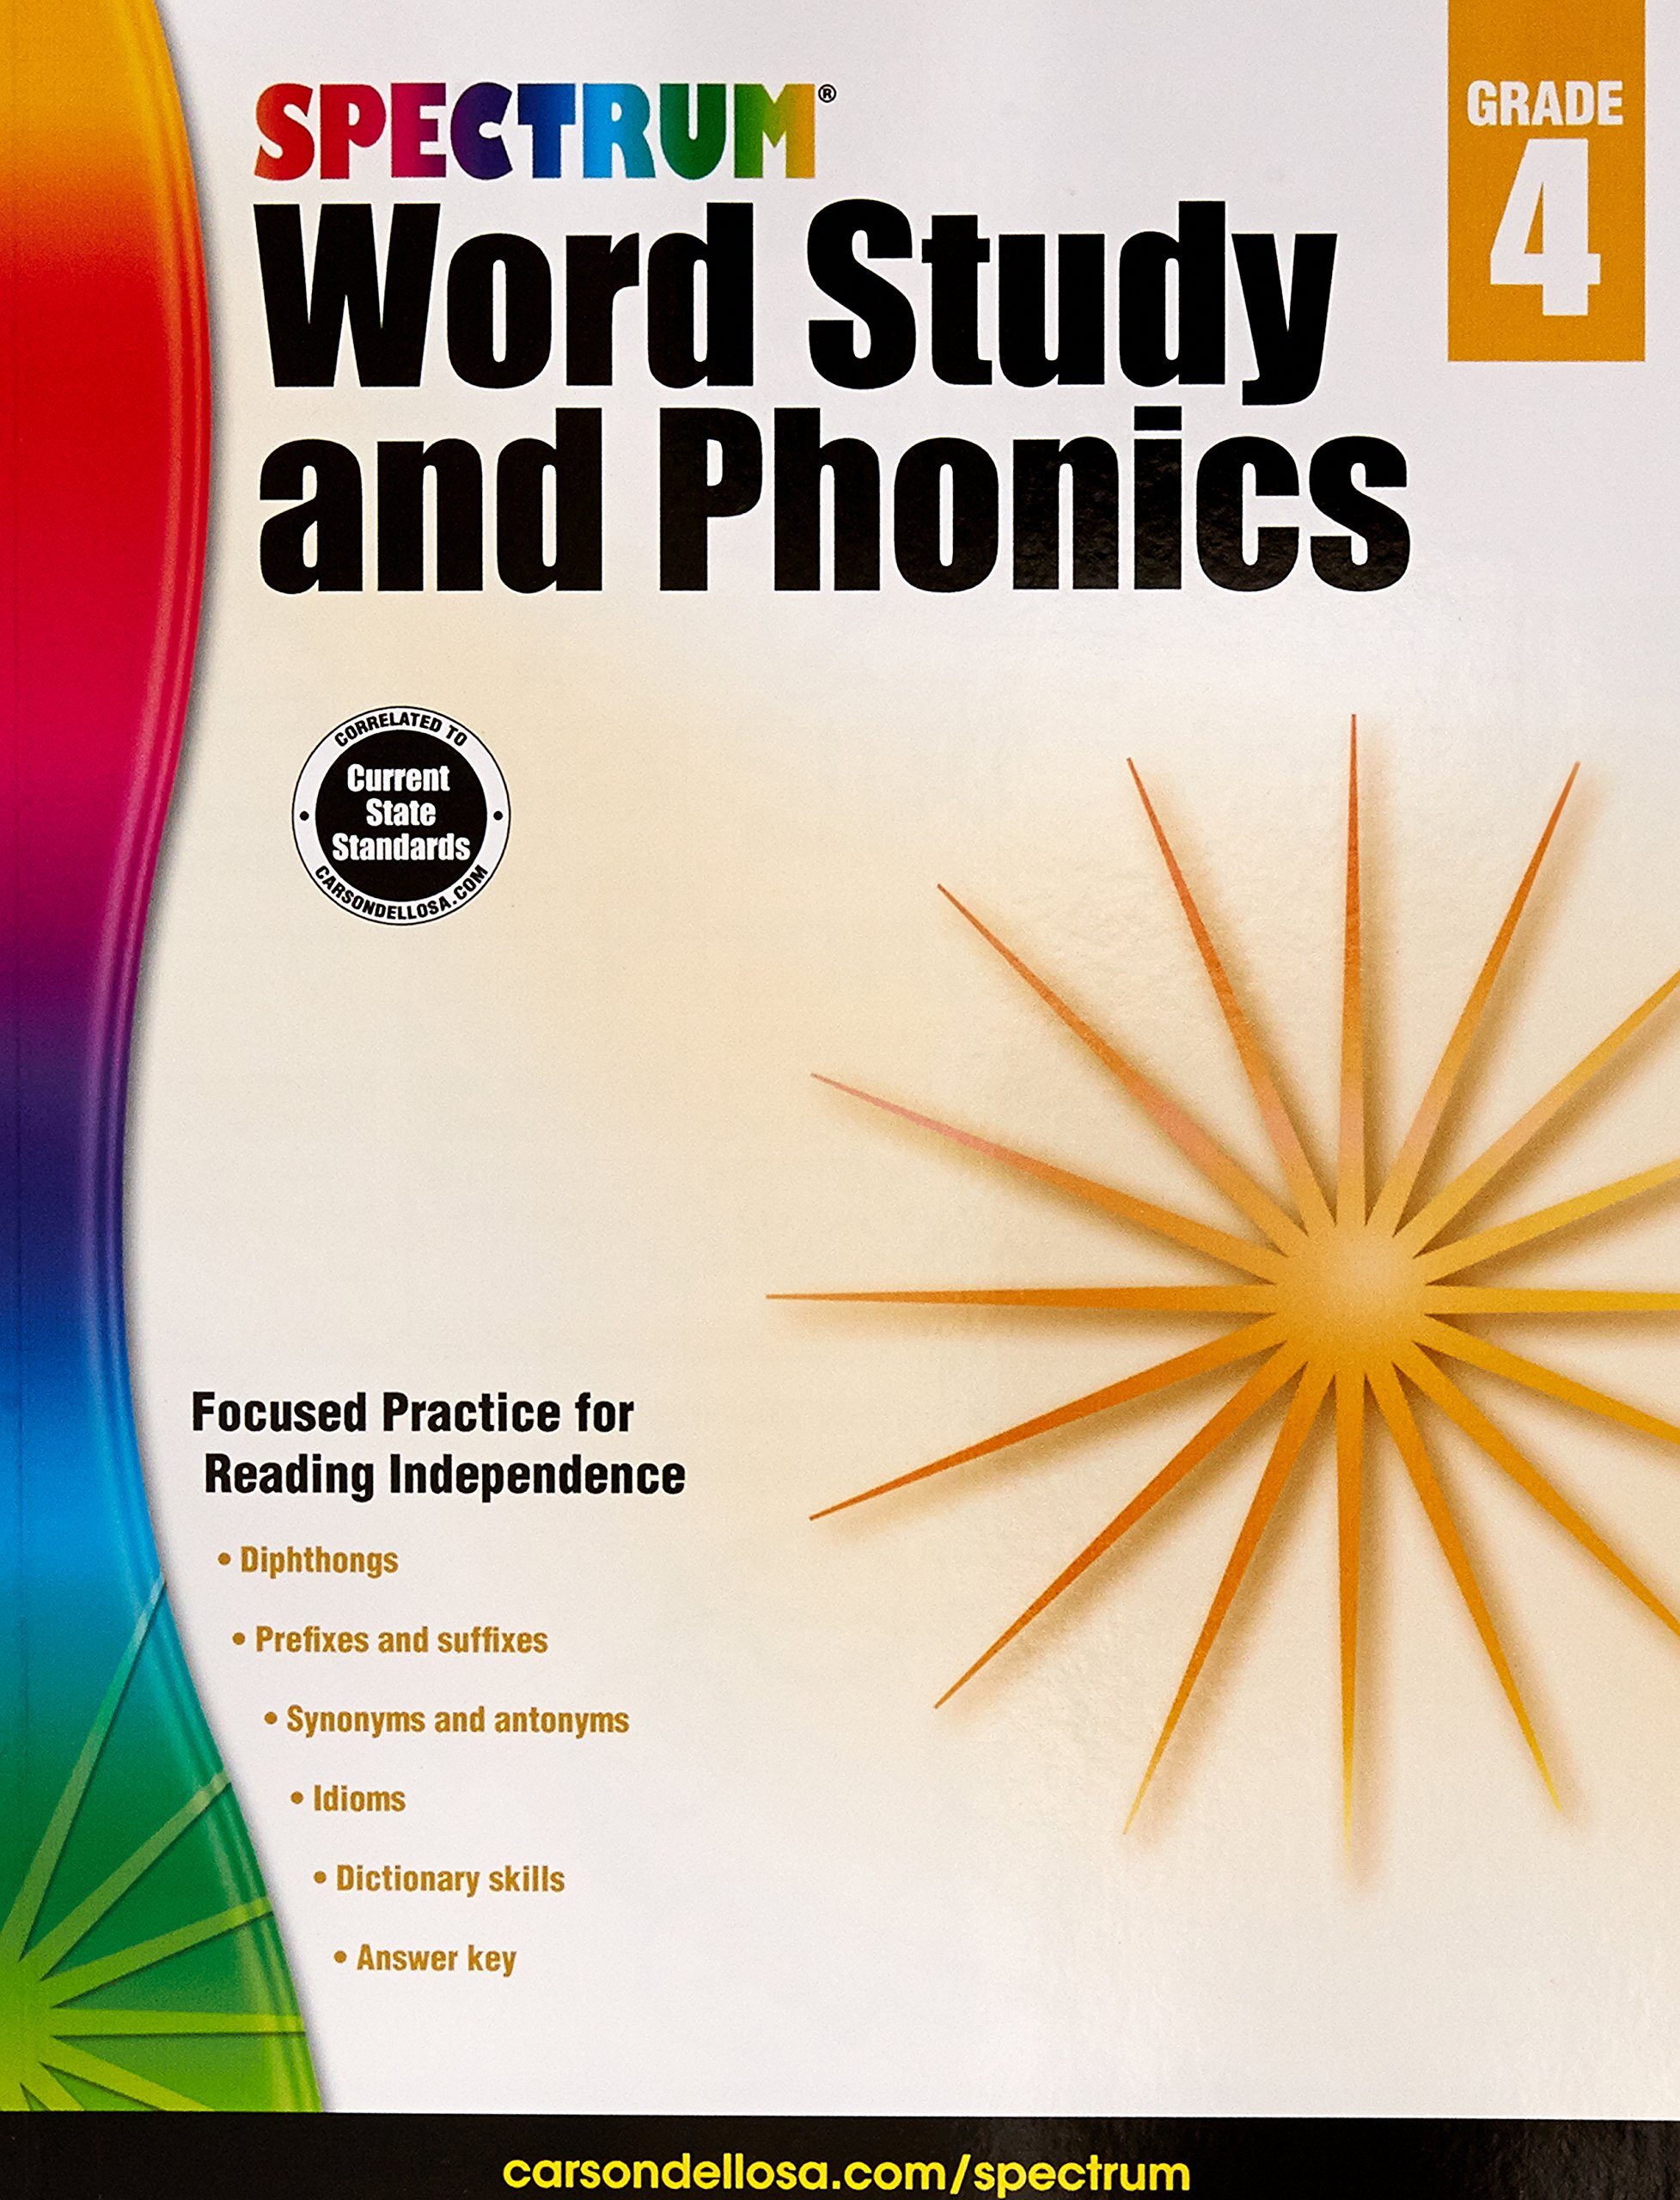 Spectrum Word Study and Phonics, Grade 4